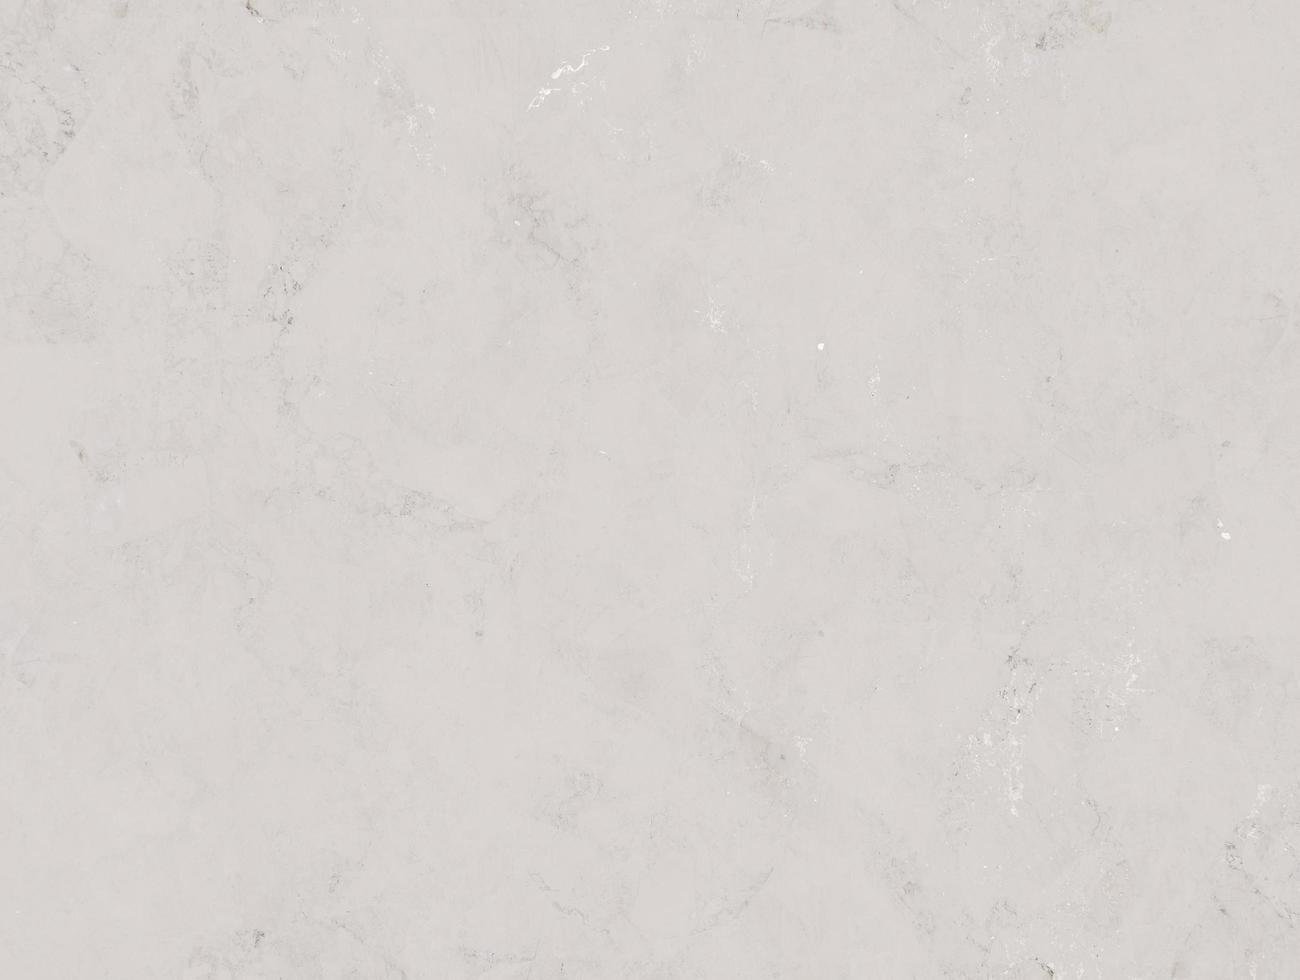 Neutral stone texture background photo